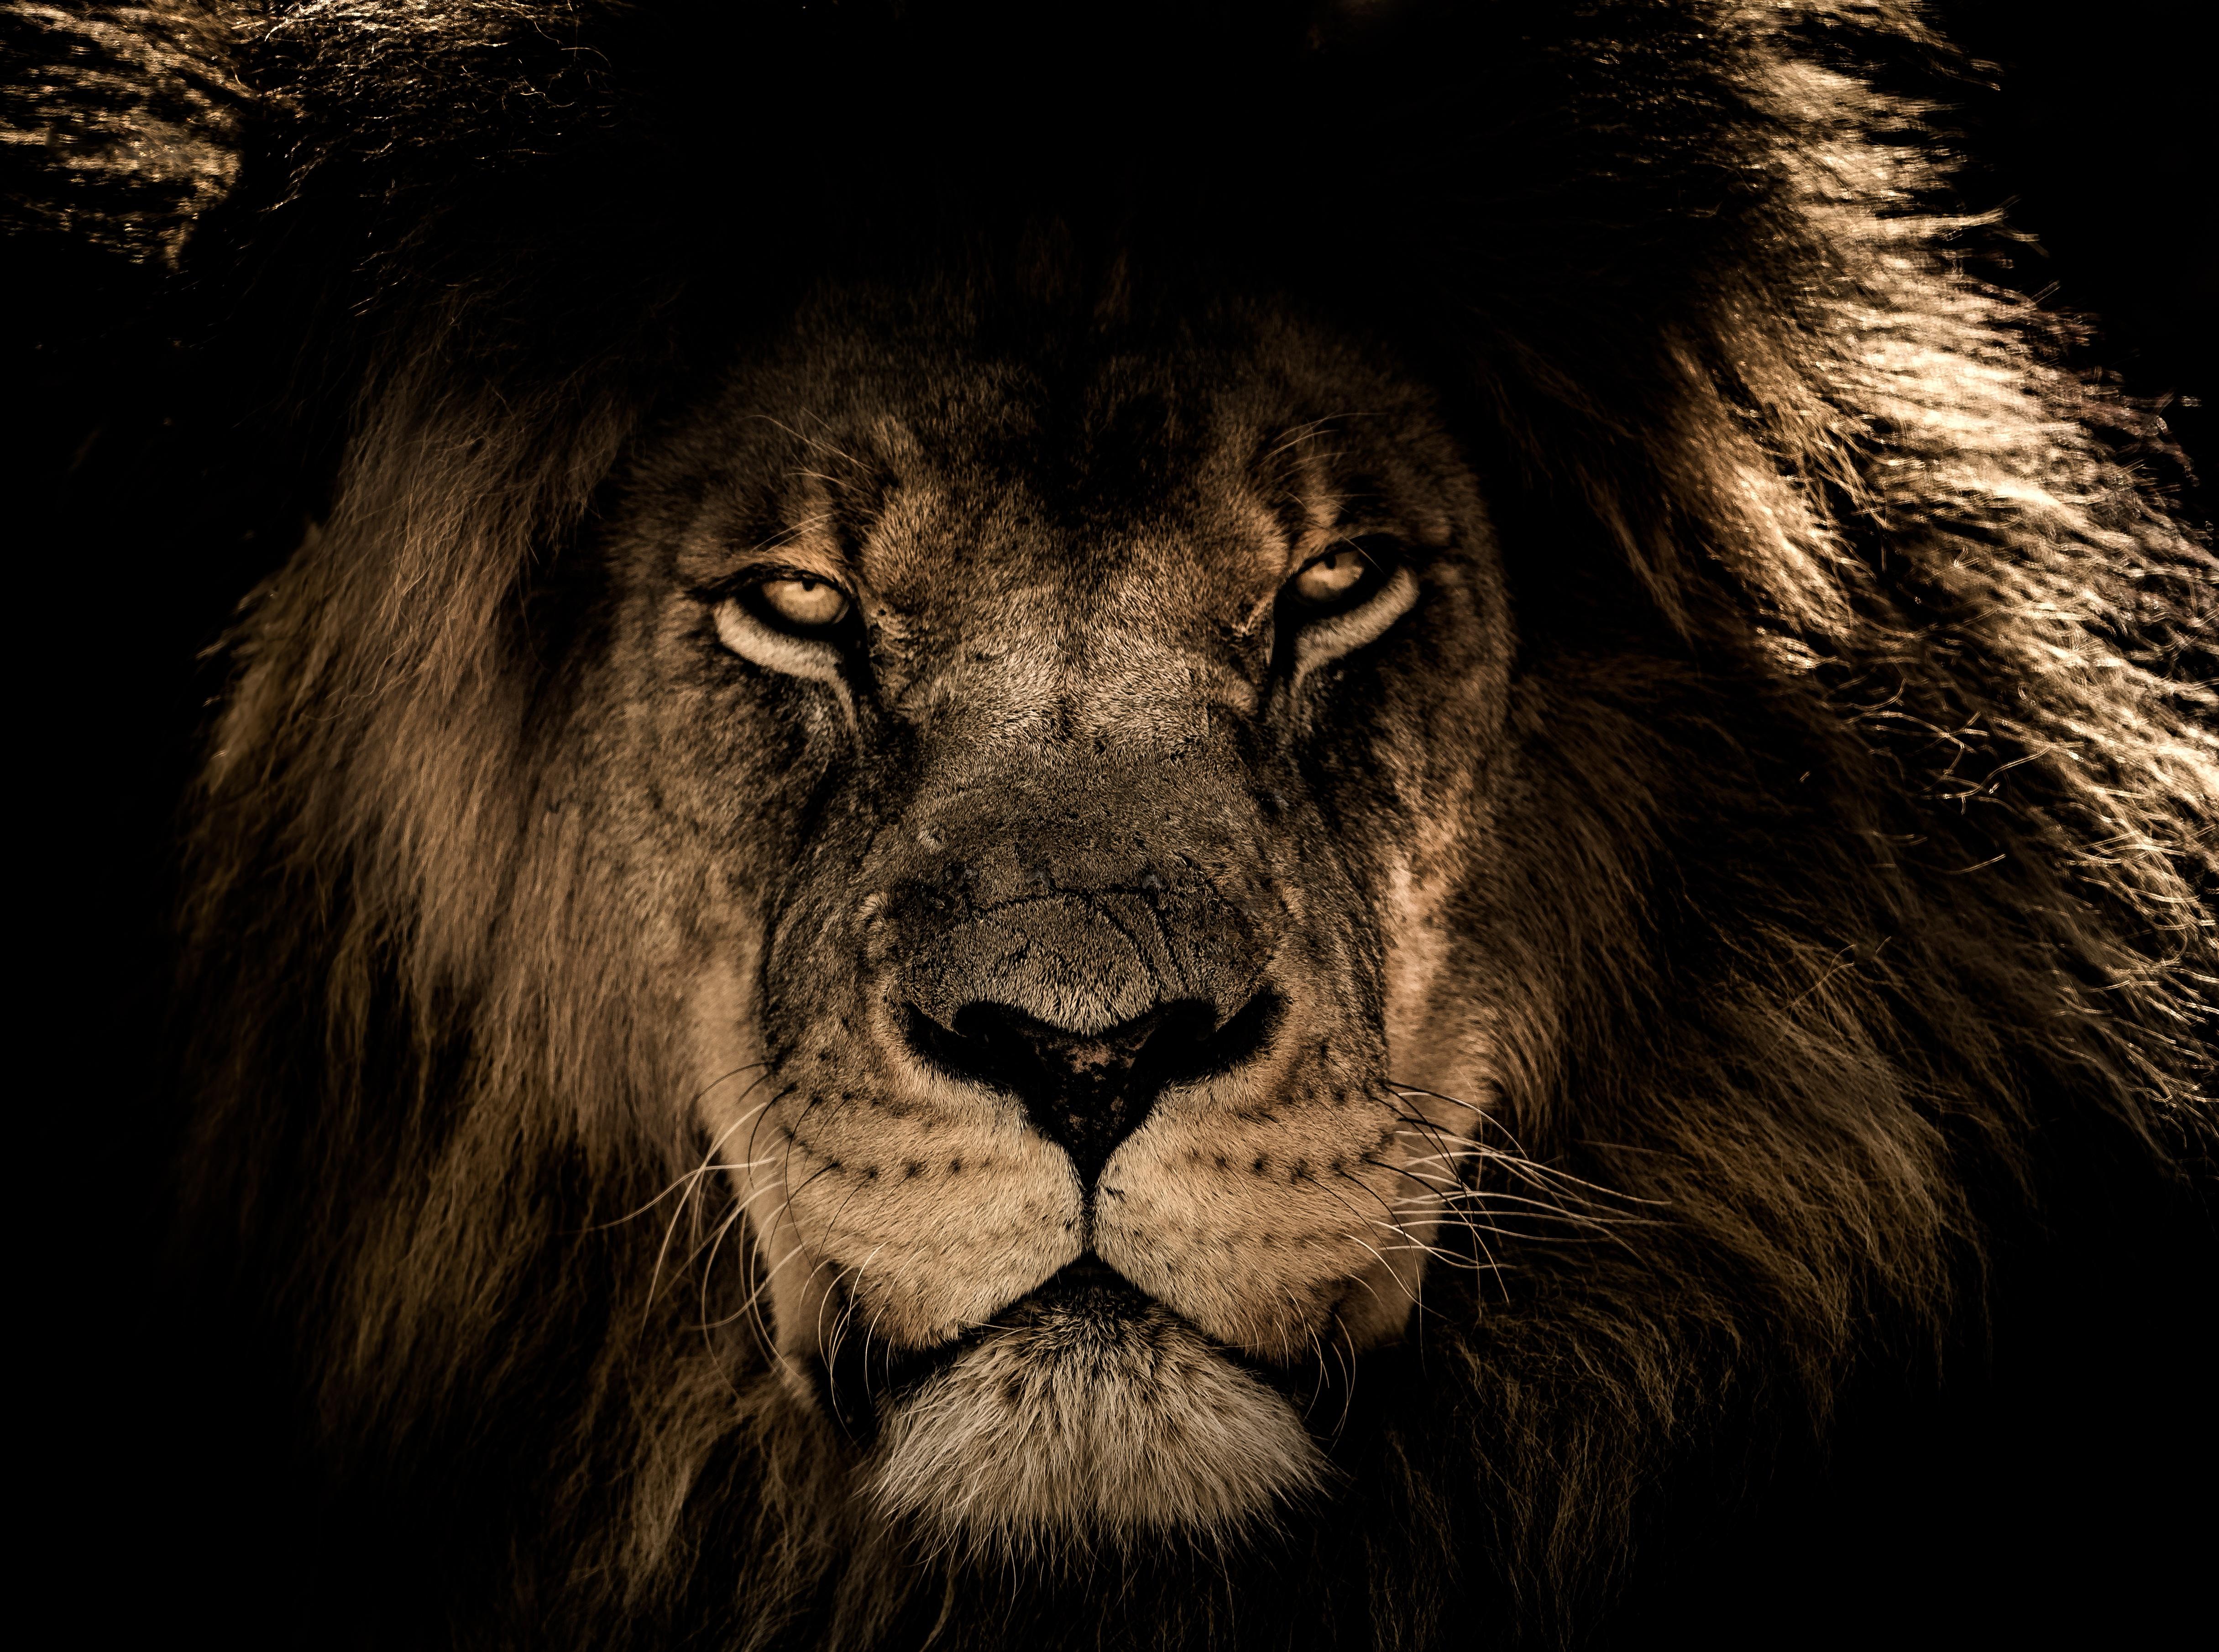 African lion face closeup 5k hd animals 4k wallpapers - Lion 4k wallpaper for mobile ...